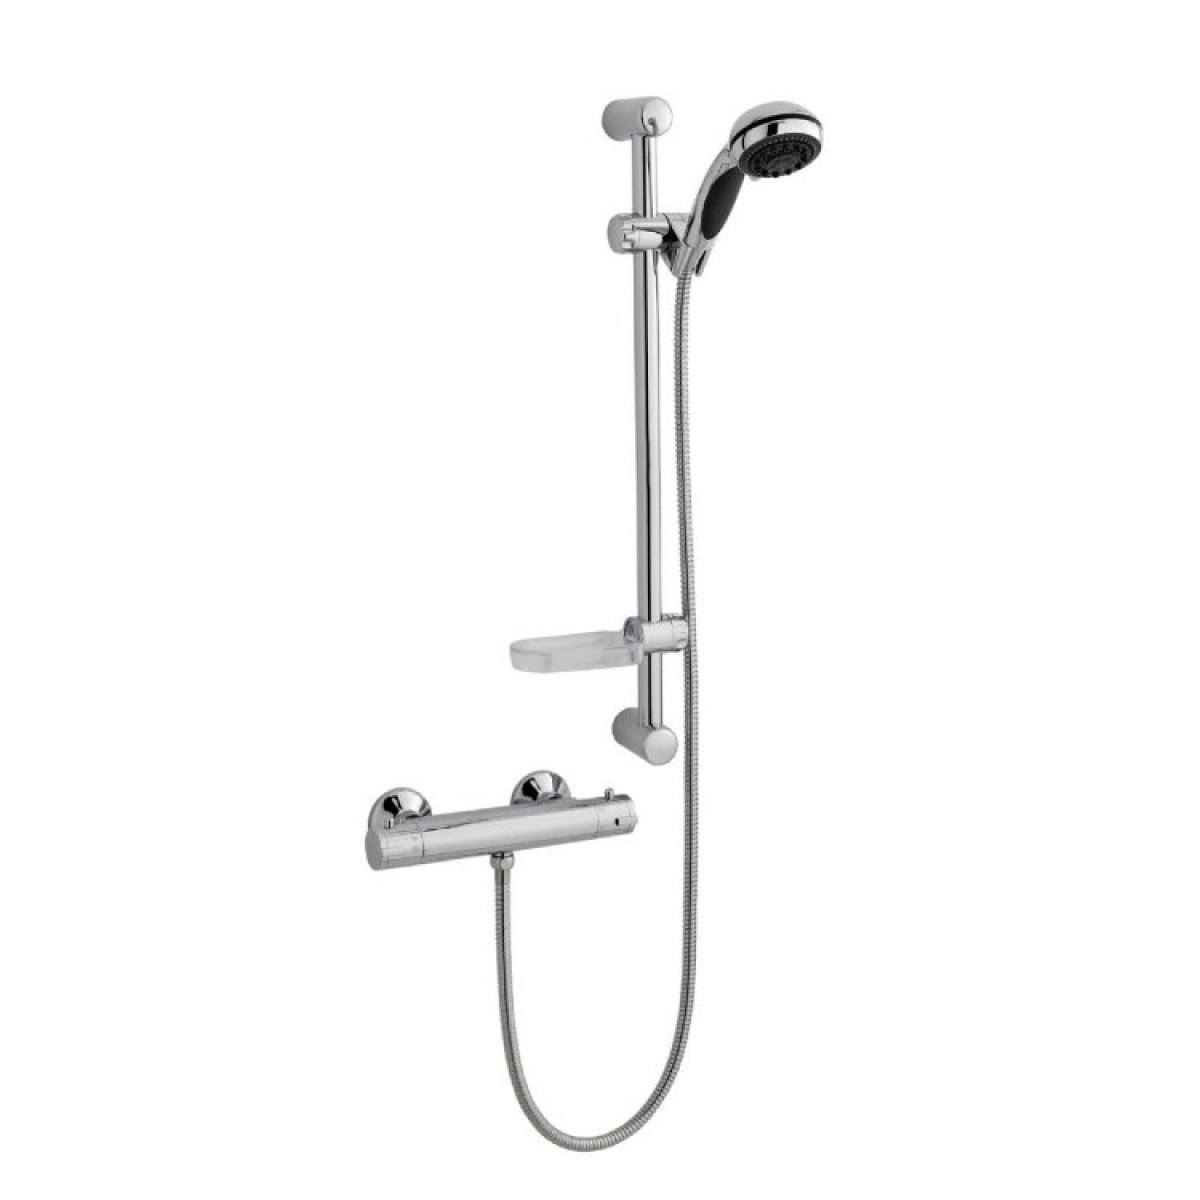 K-Vit Kartell Plan thermostatic bar mixer shower